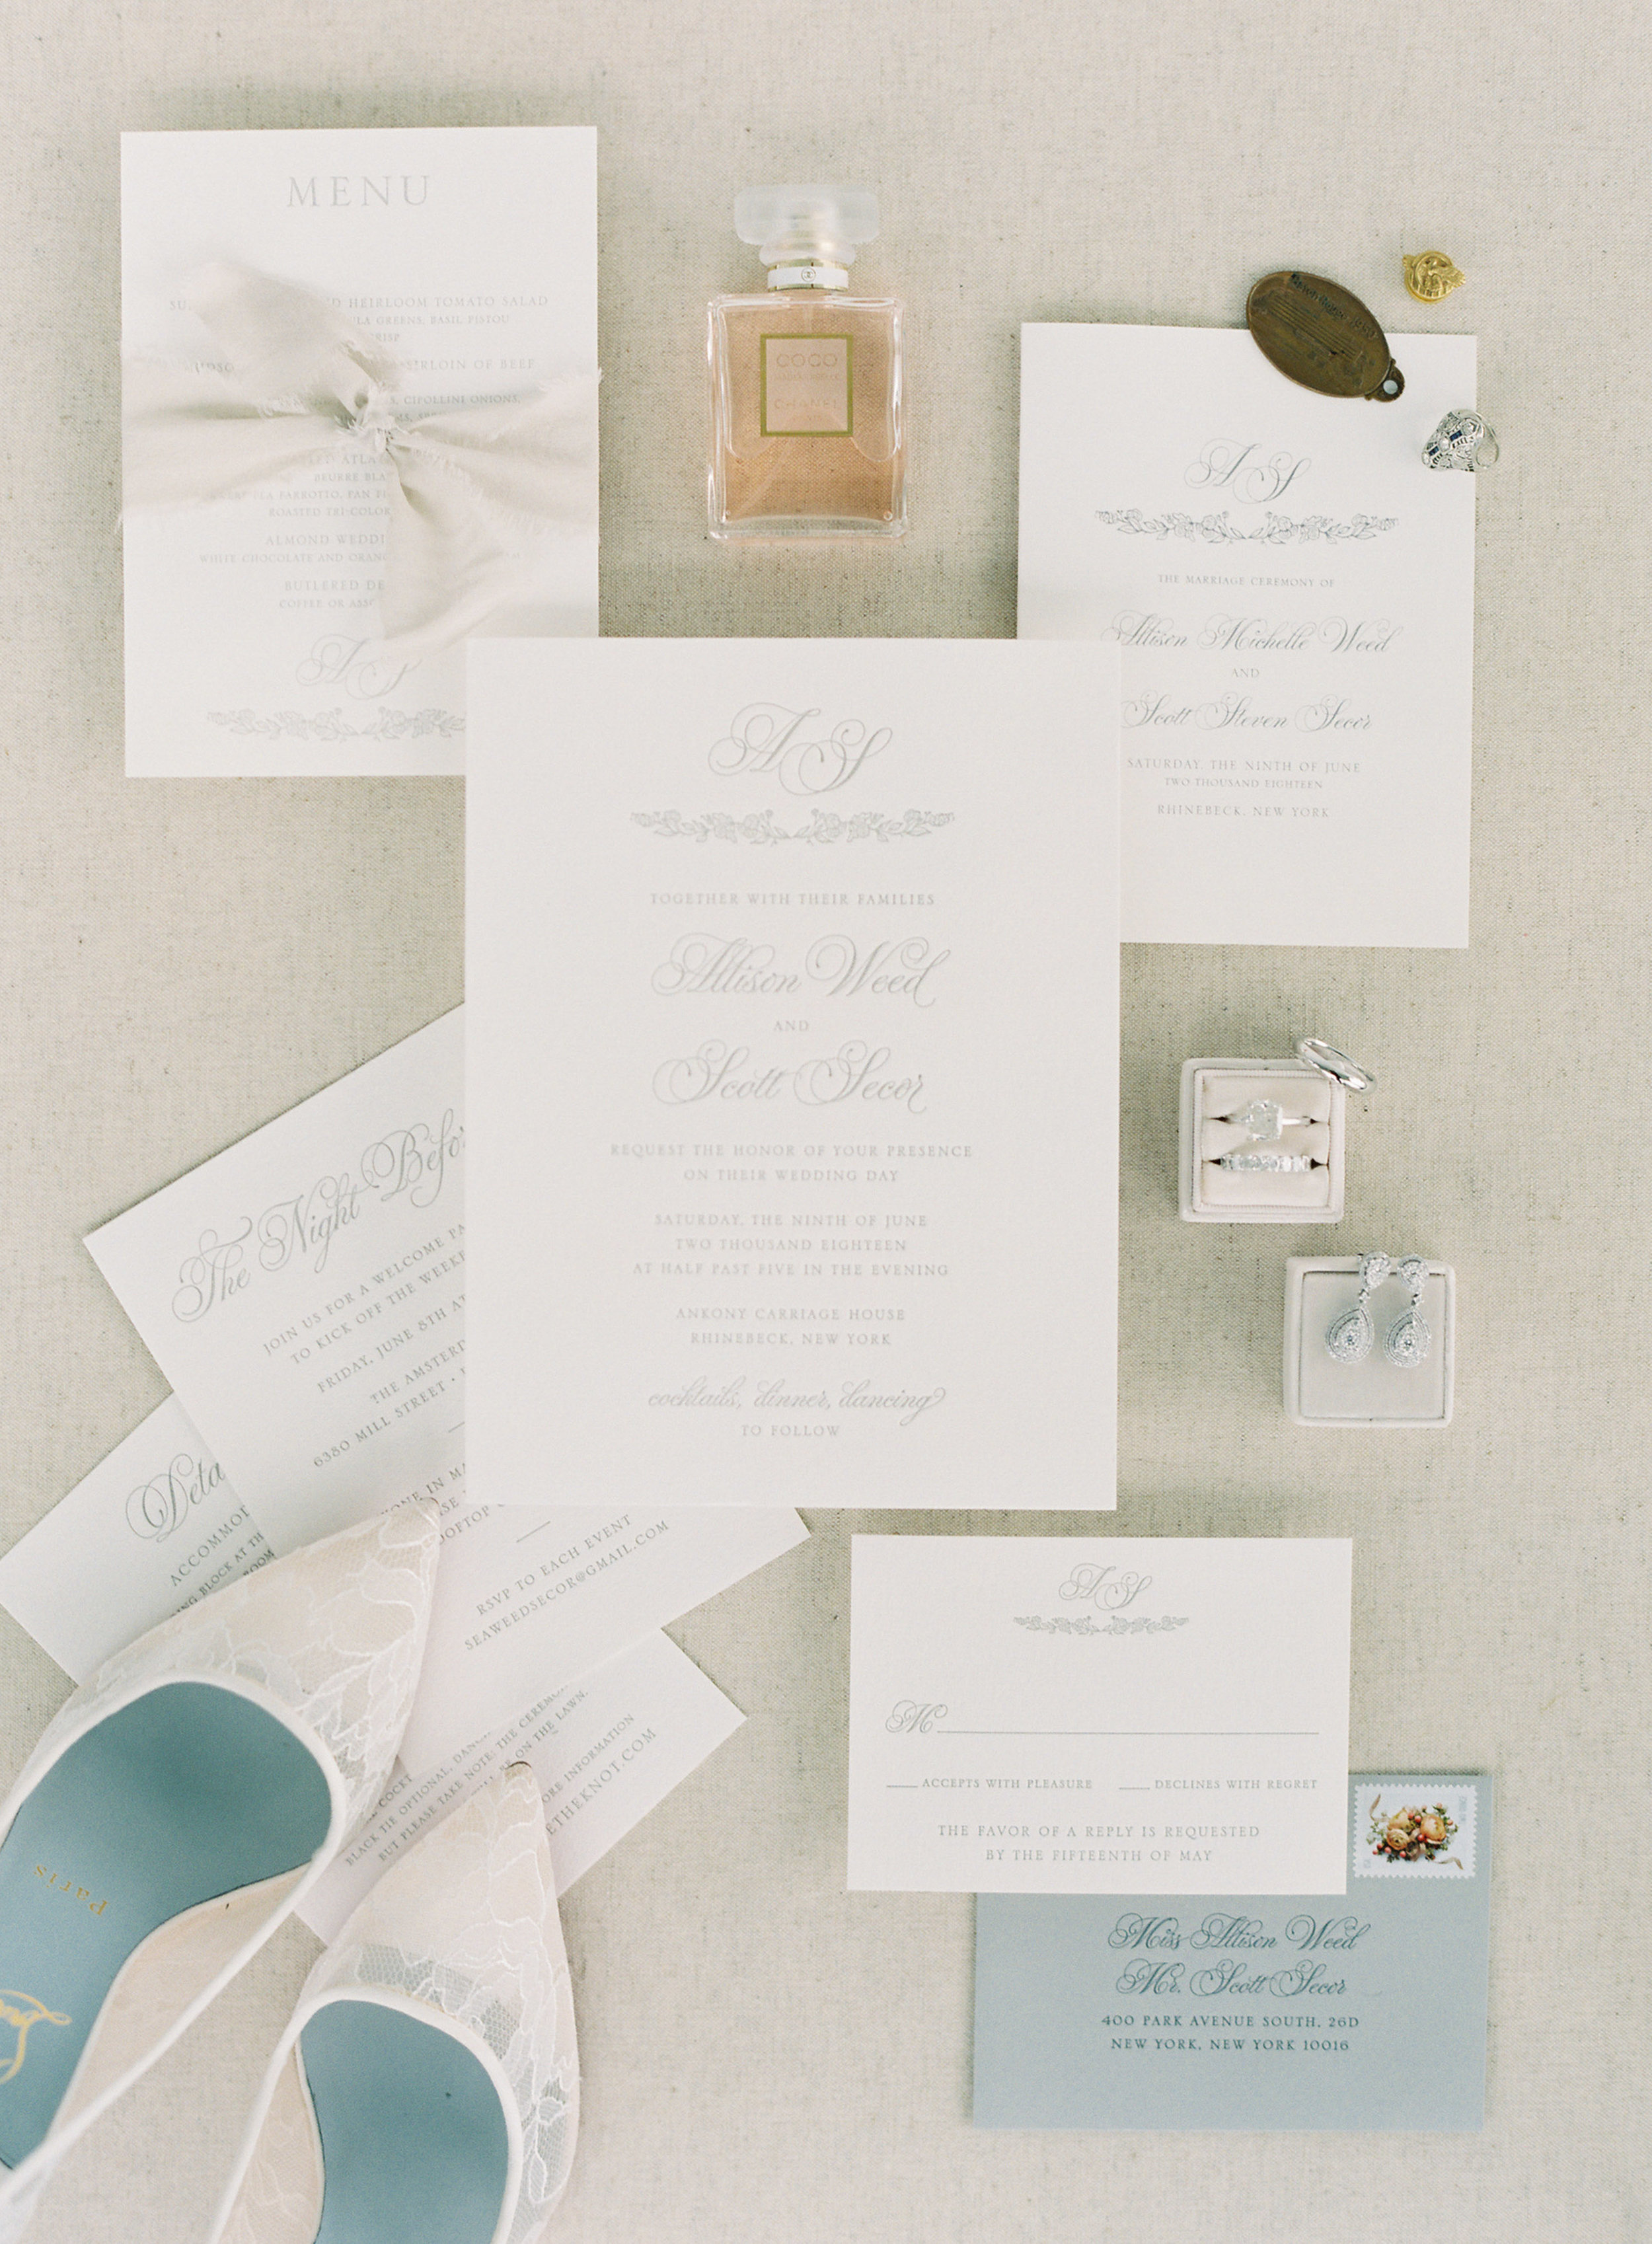 Ankony_Farm_Wedding-8-Jen-Huang-AS-341-Jen-Huang-003144-R1-001.jpg